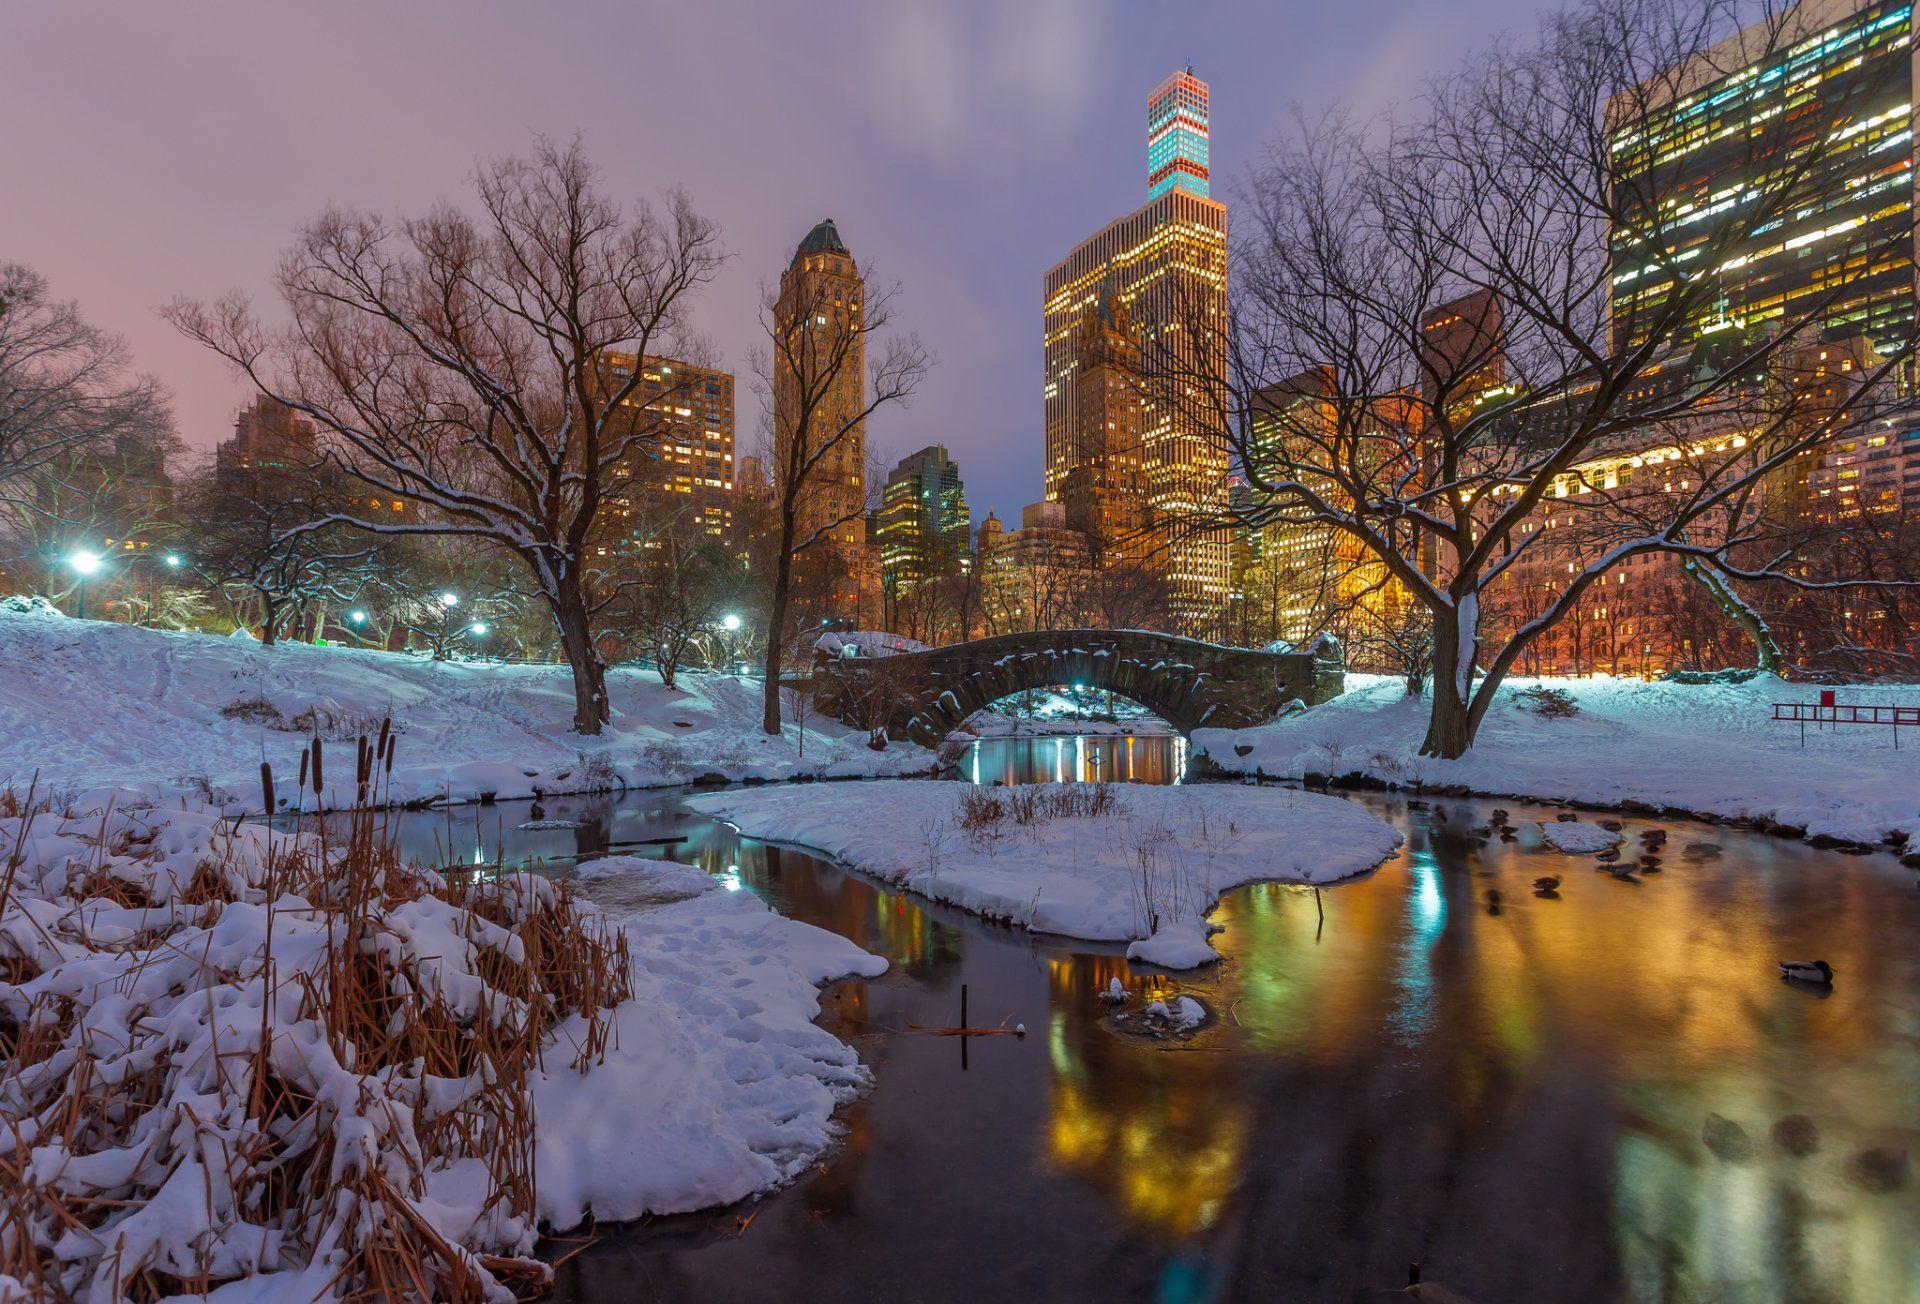 Man Made Central Park Night New York USA Winter Snow Bridge 1920x1304